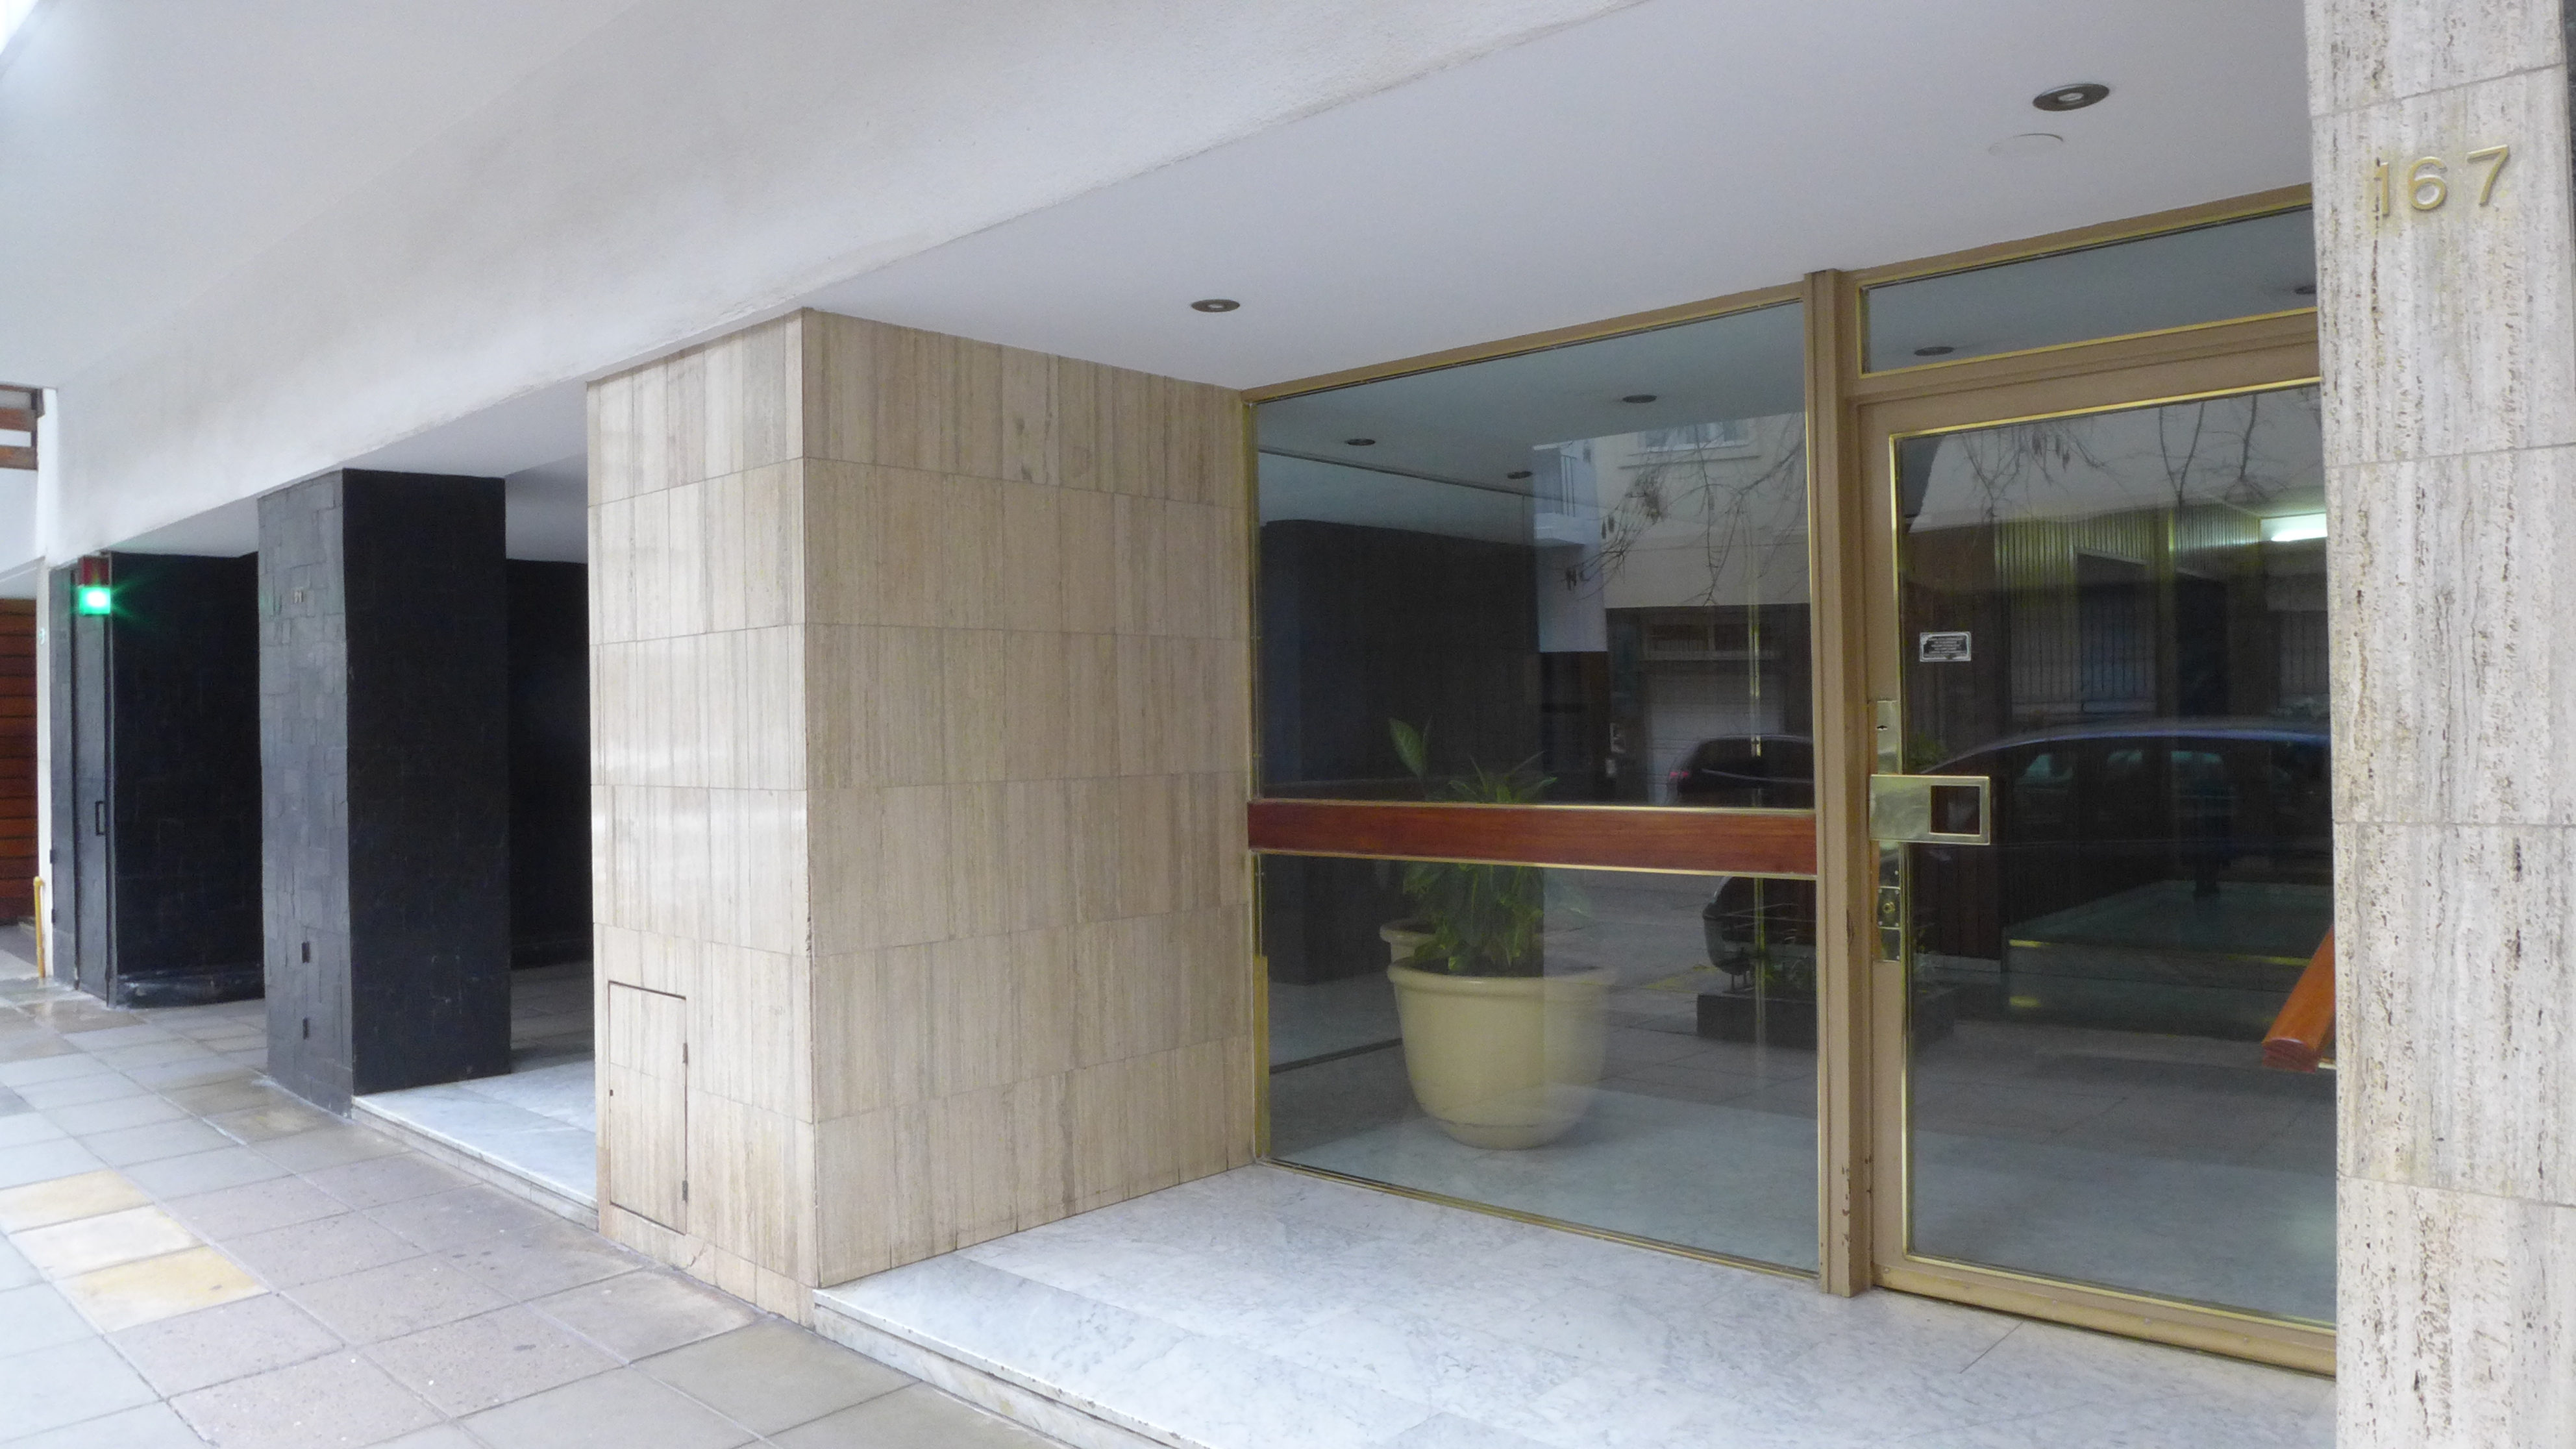 Entrada edificio arquitectura propiedades - Decoracion hall de entrada edificios ...